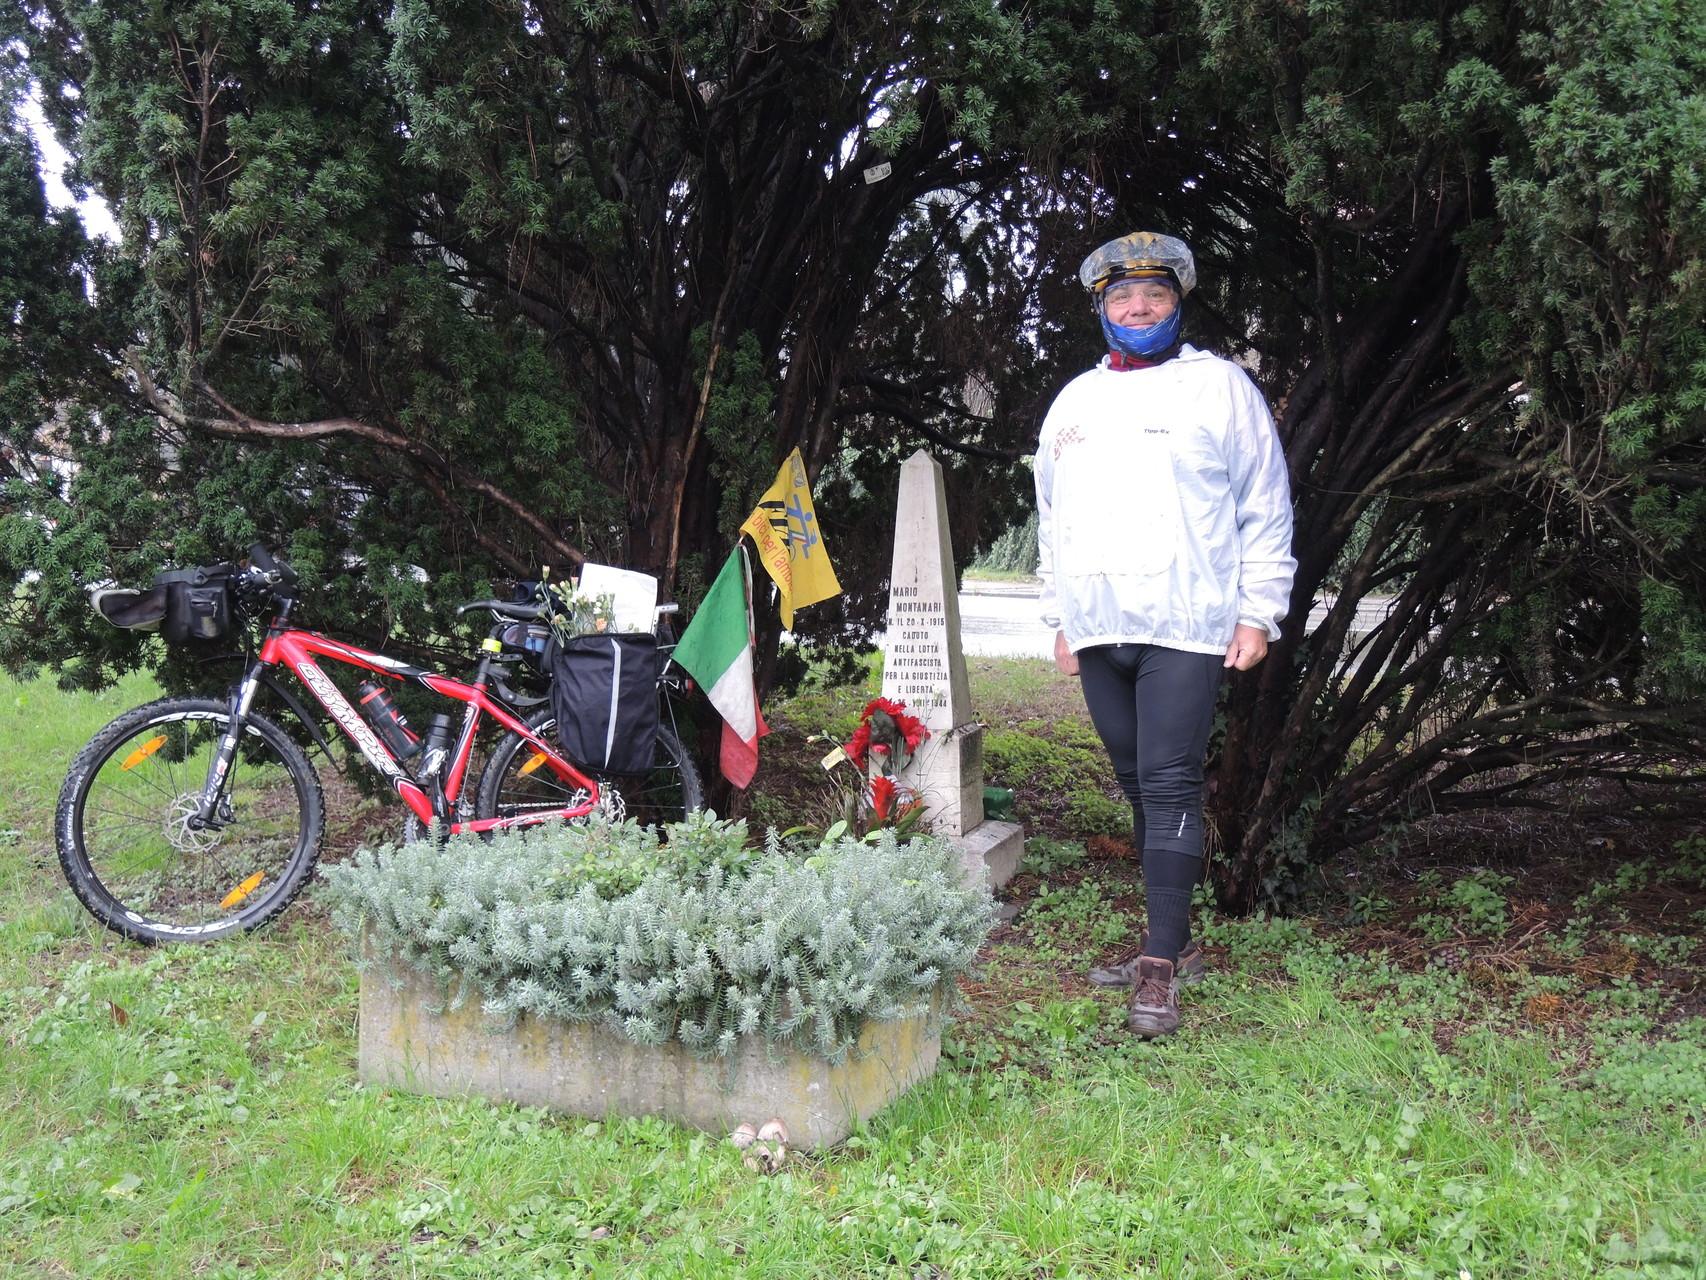 Cippo Prof. Mario Montanari in Via Piave